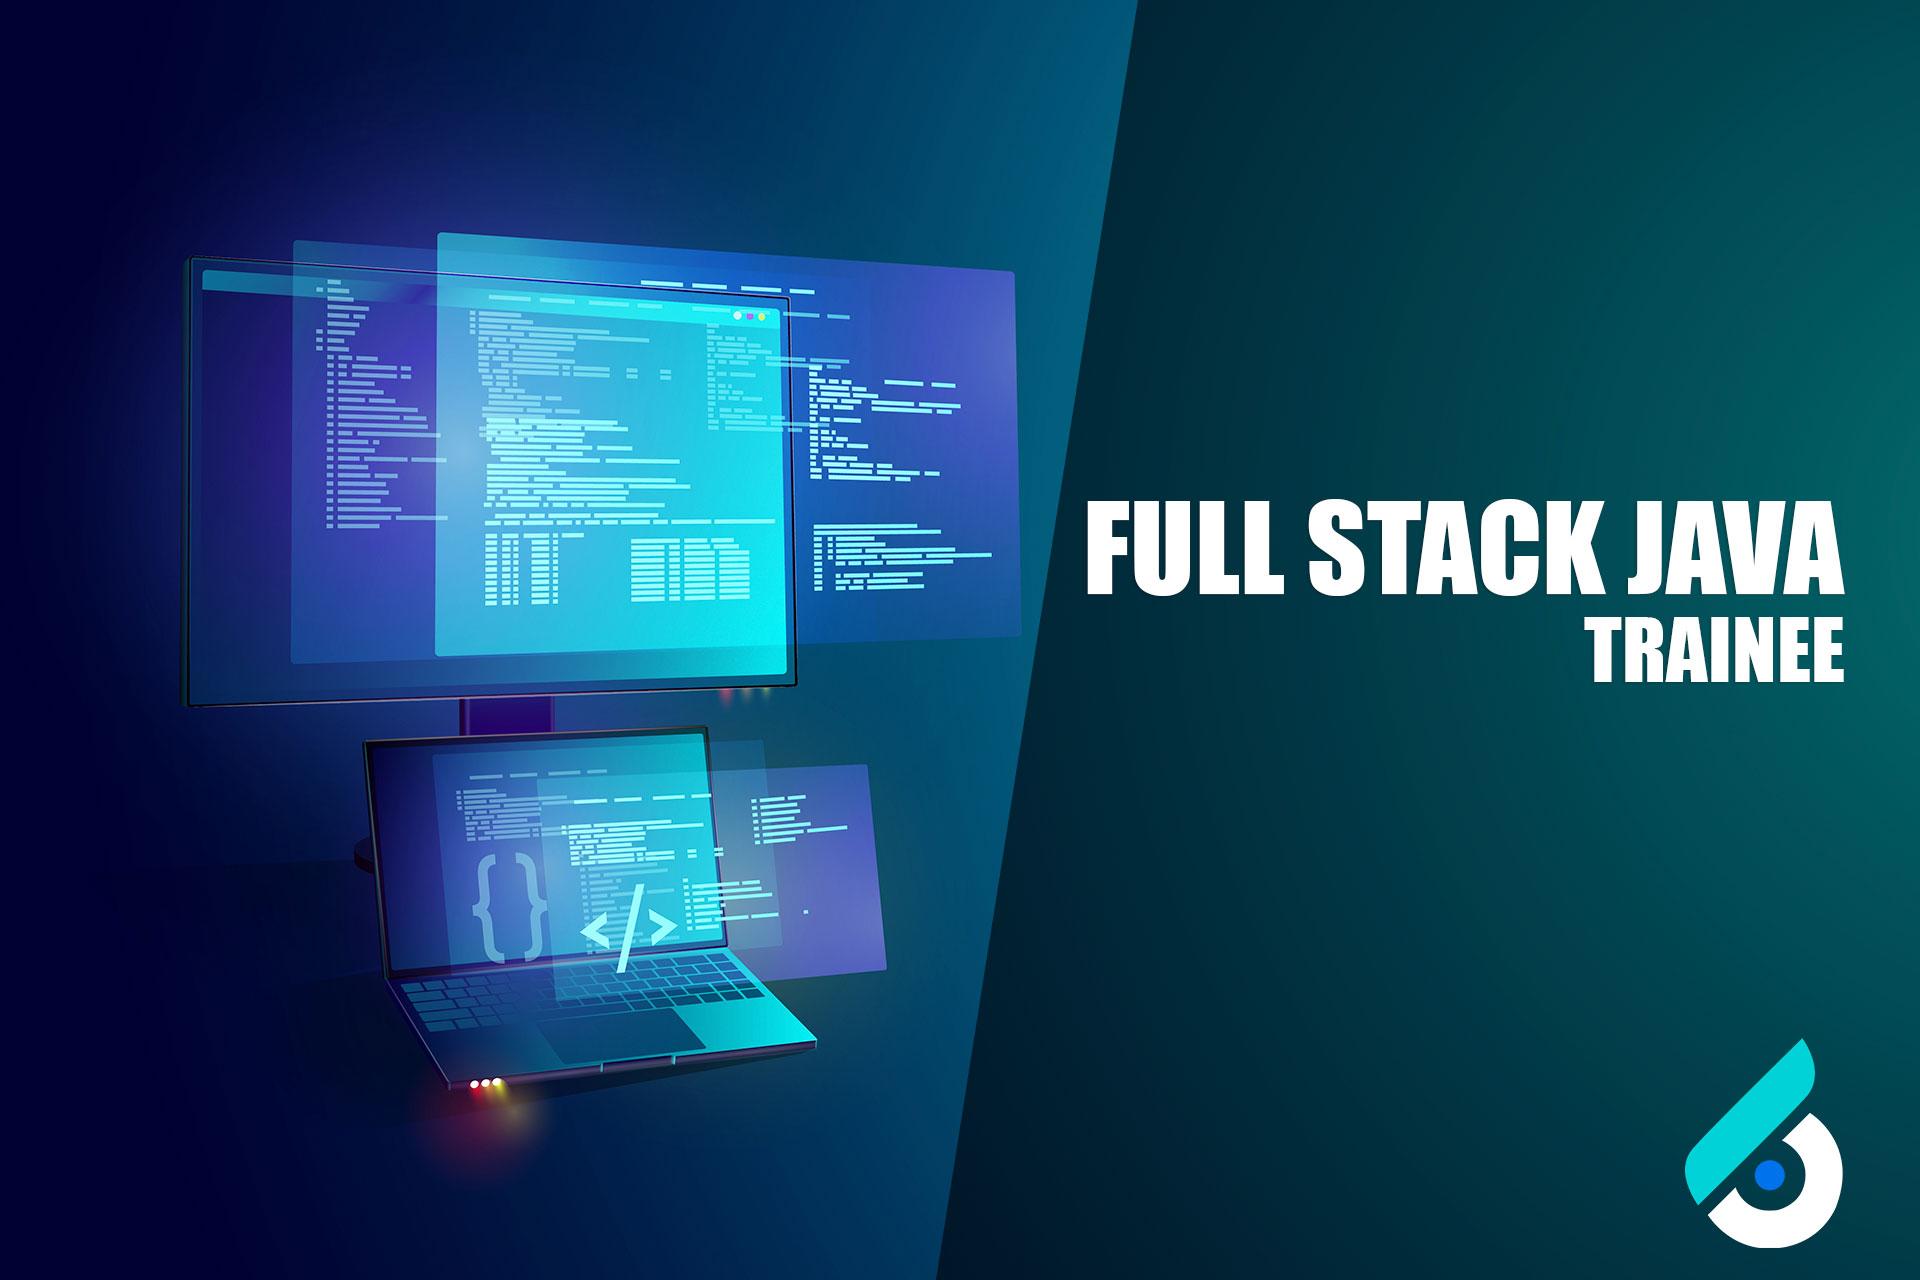 RLAB-20-01-13-0156-4 | Desarrollo de Aplicaciones Full Stack Java Trainee